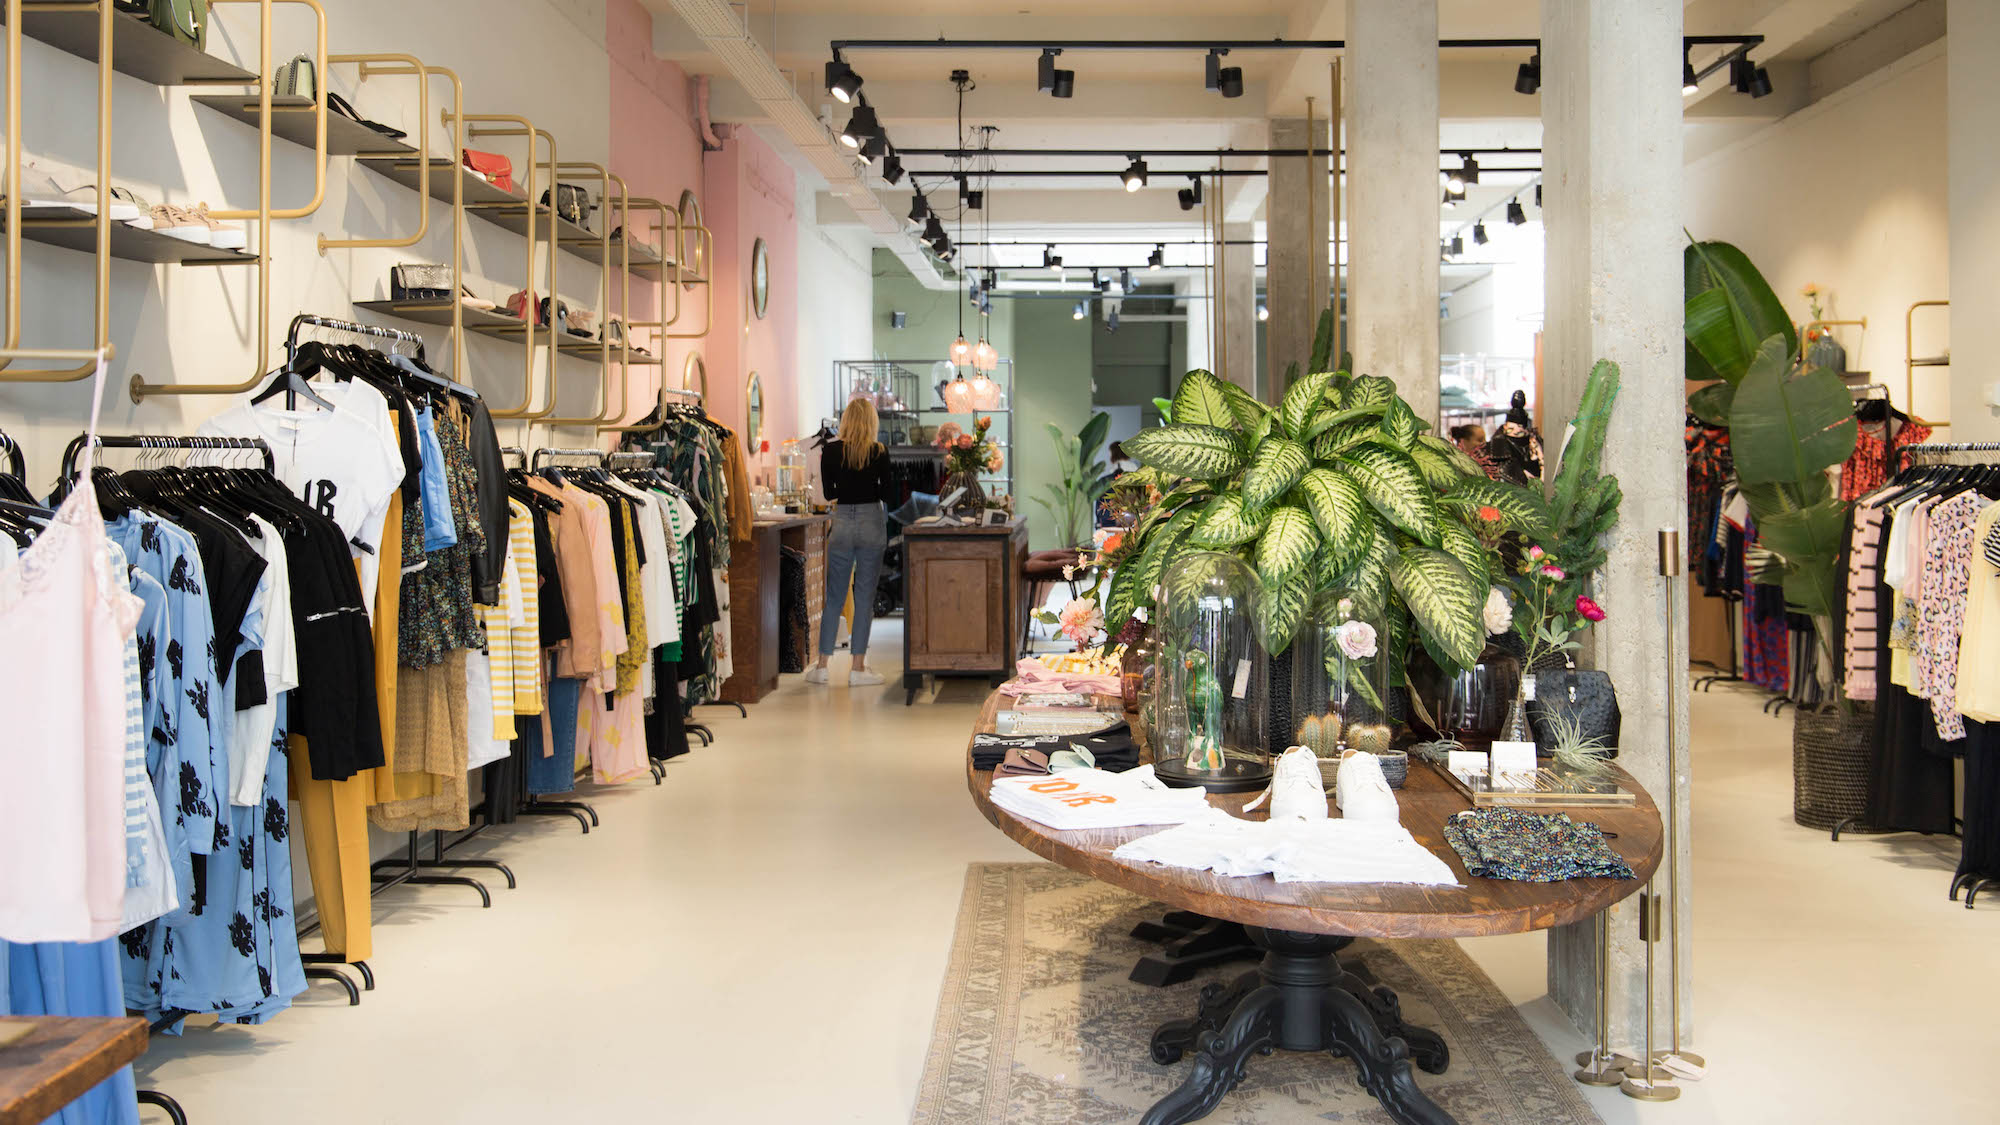 Unconventional Wardrobe: The Fashion Boutique